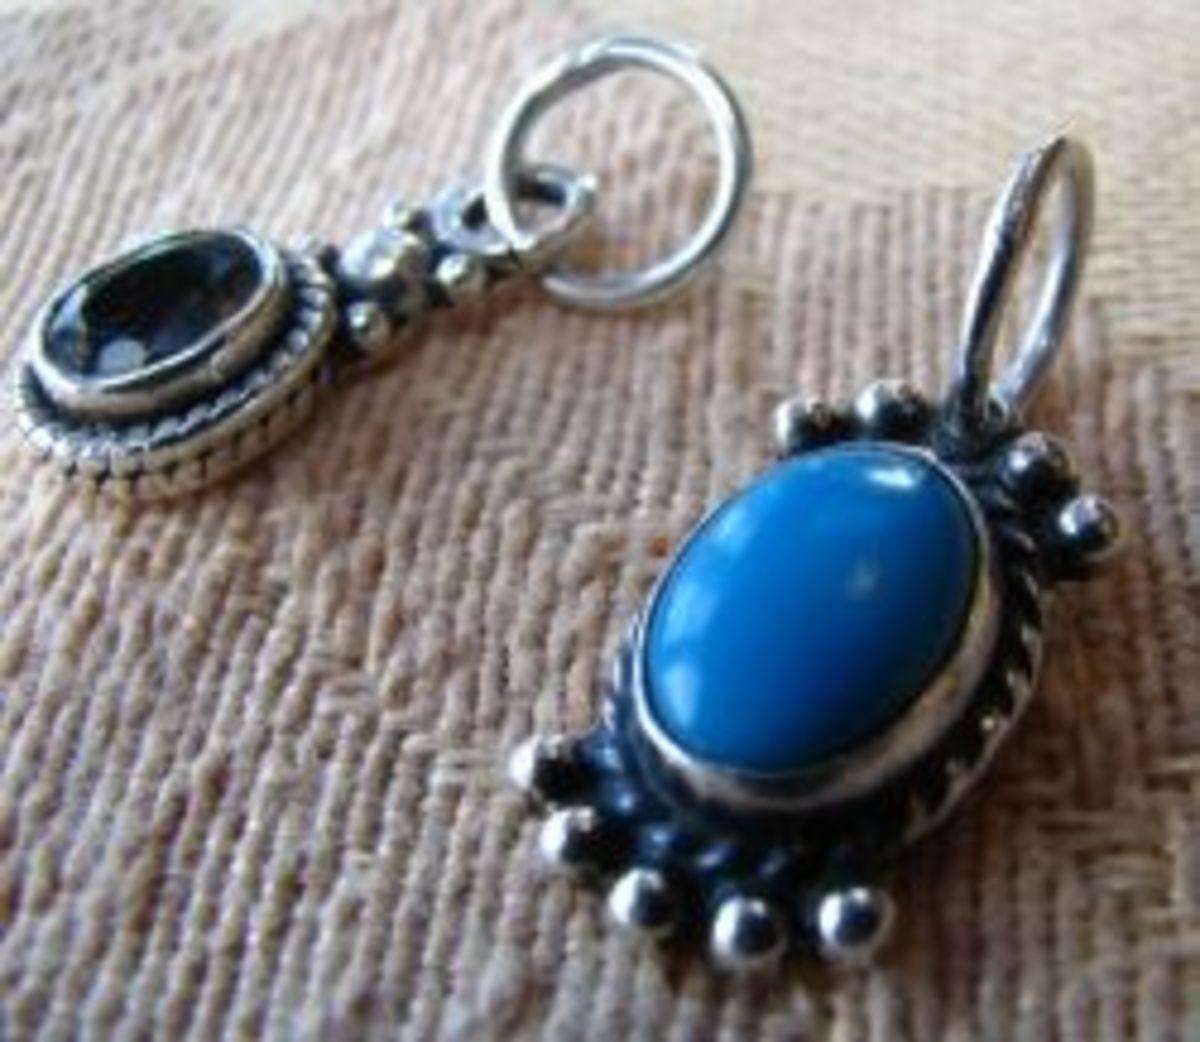 Vintage charms for Pandora bracelets photo by Diane Cass